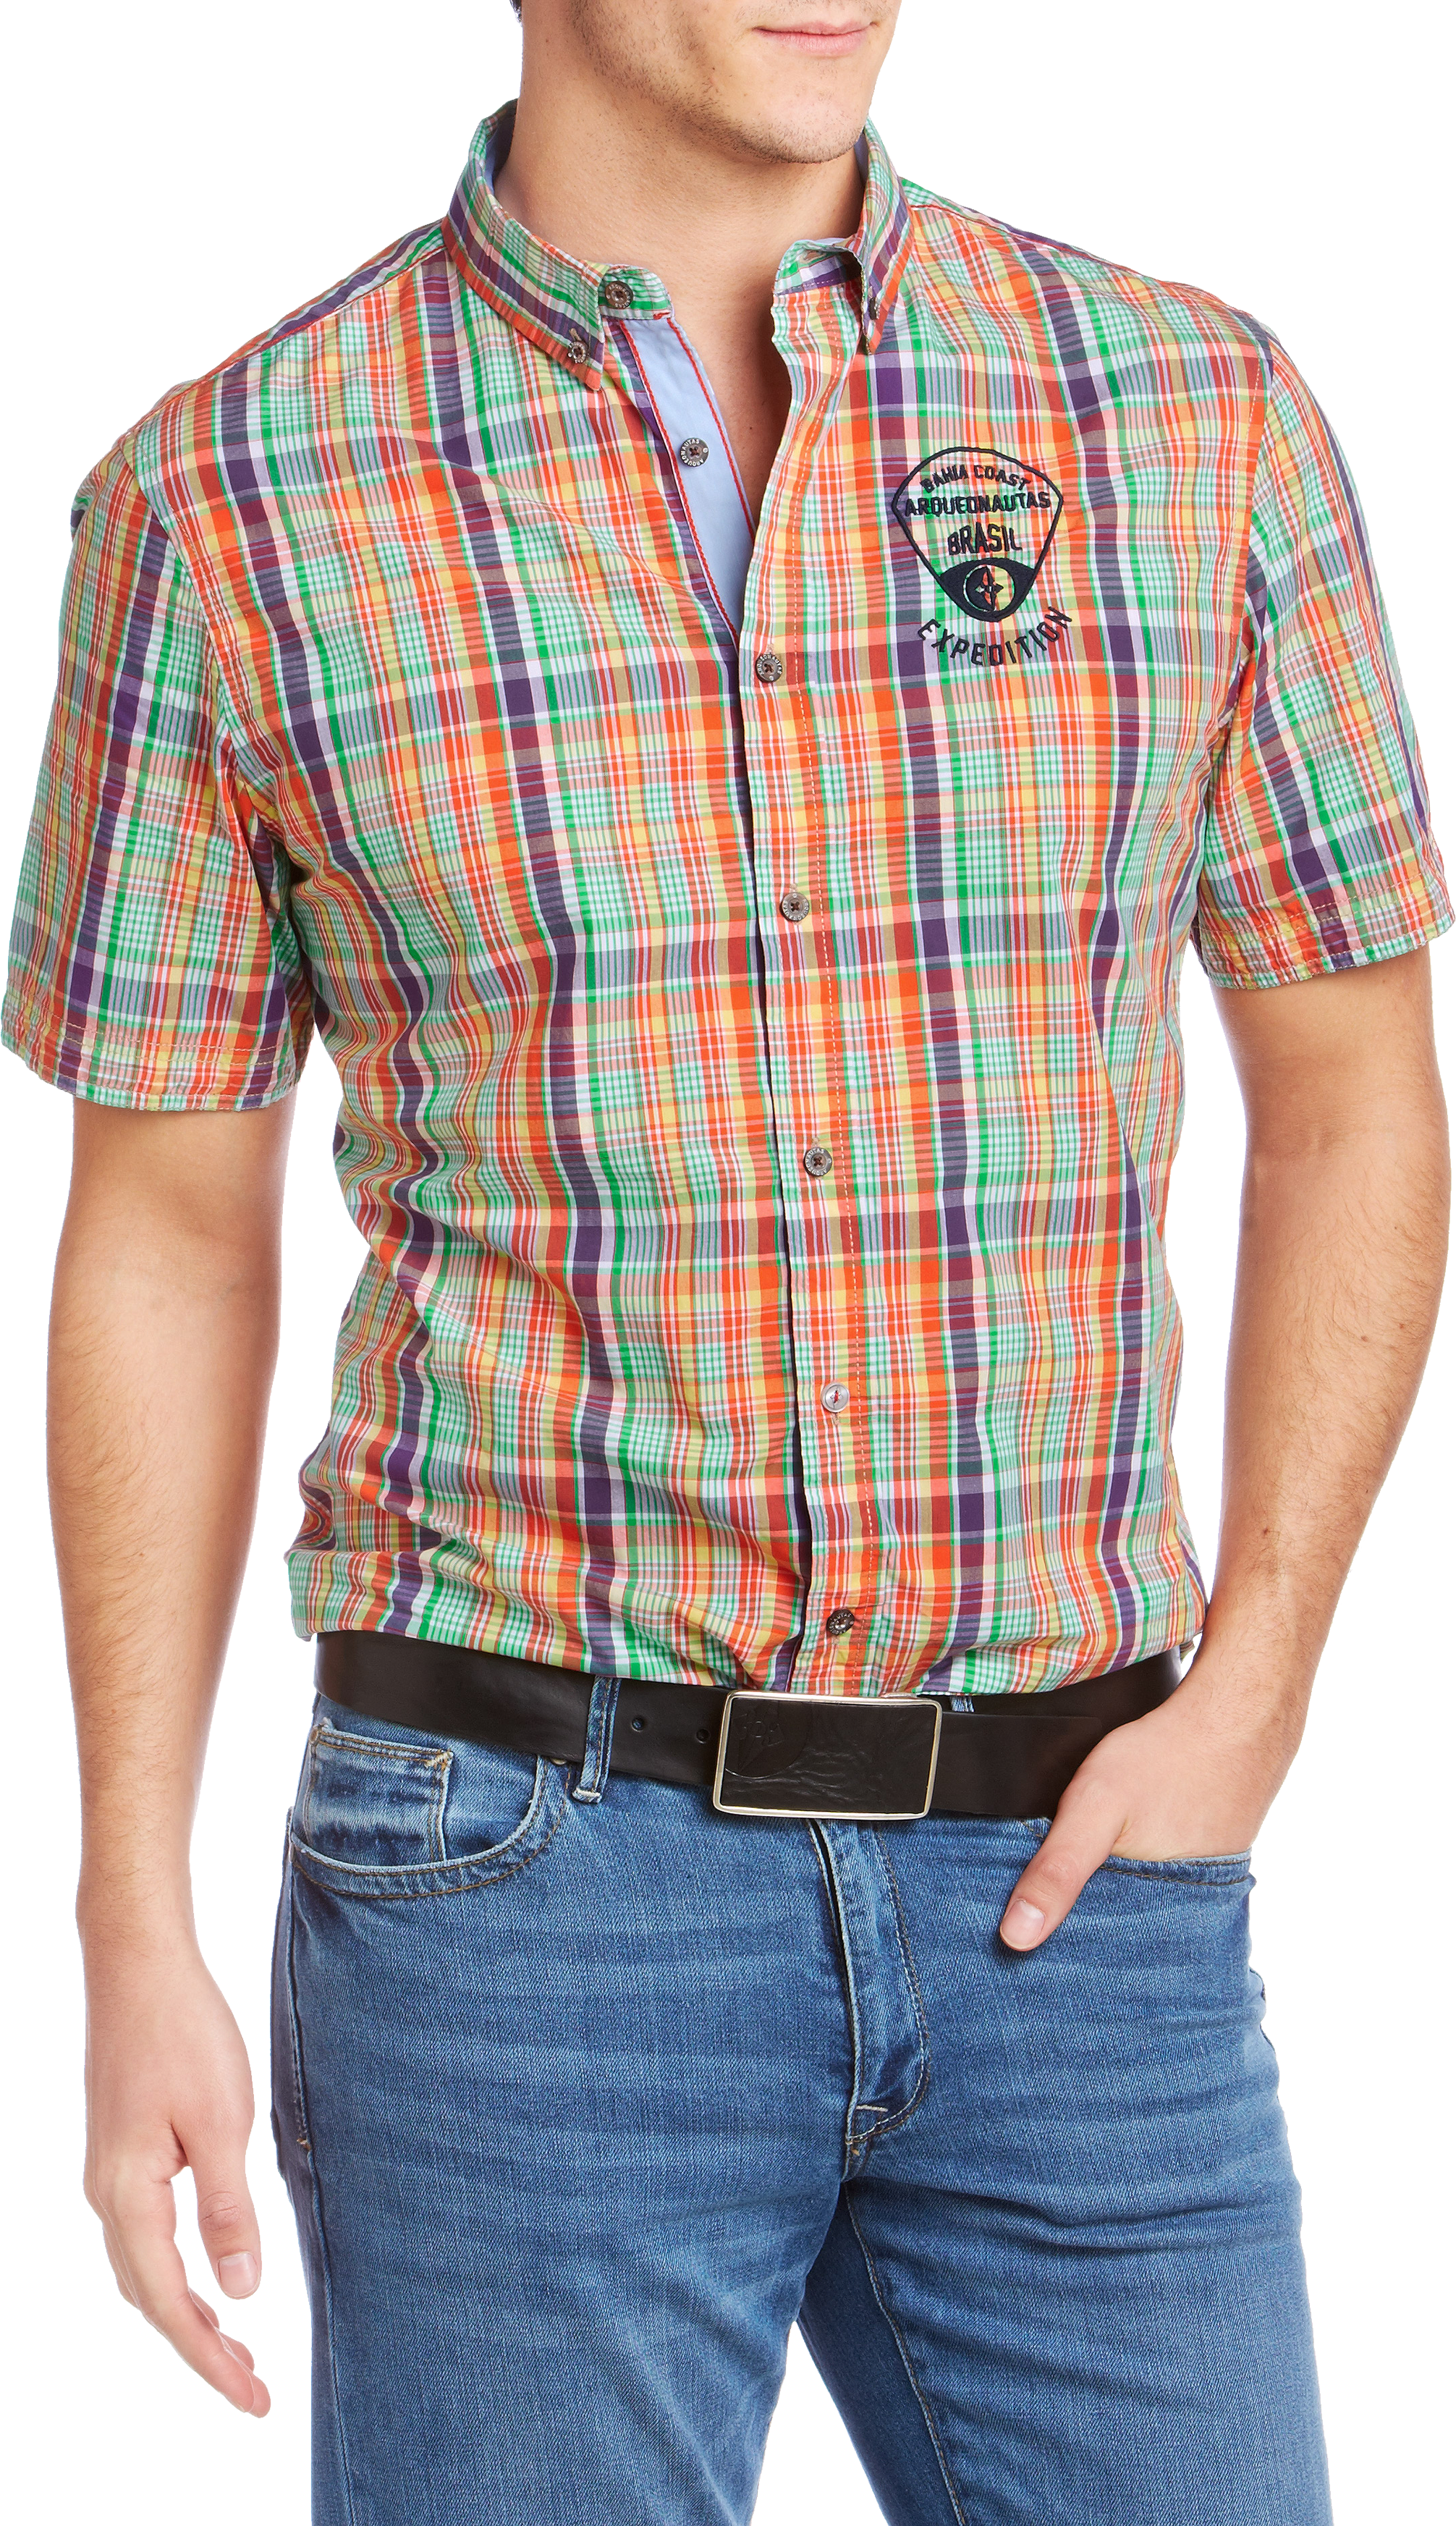 Men Clothes Png - Men Polo Shirt Png Image, Transparent background PNG HD thumbnail